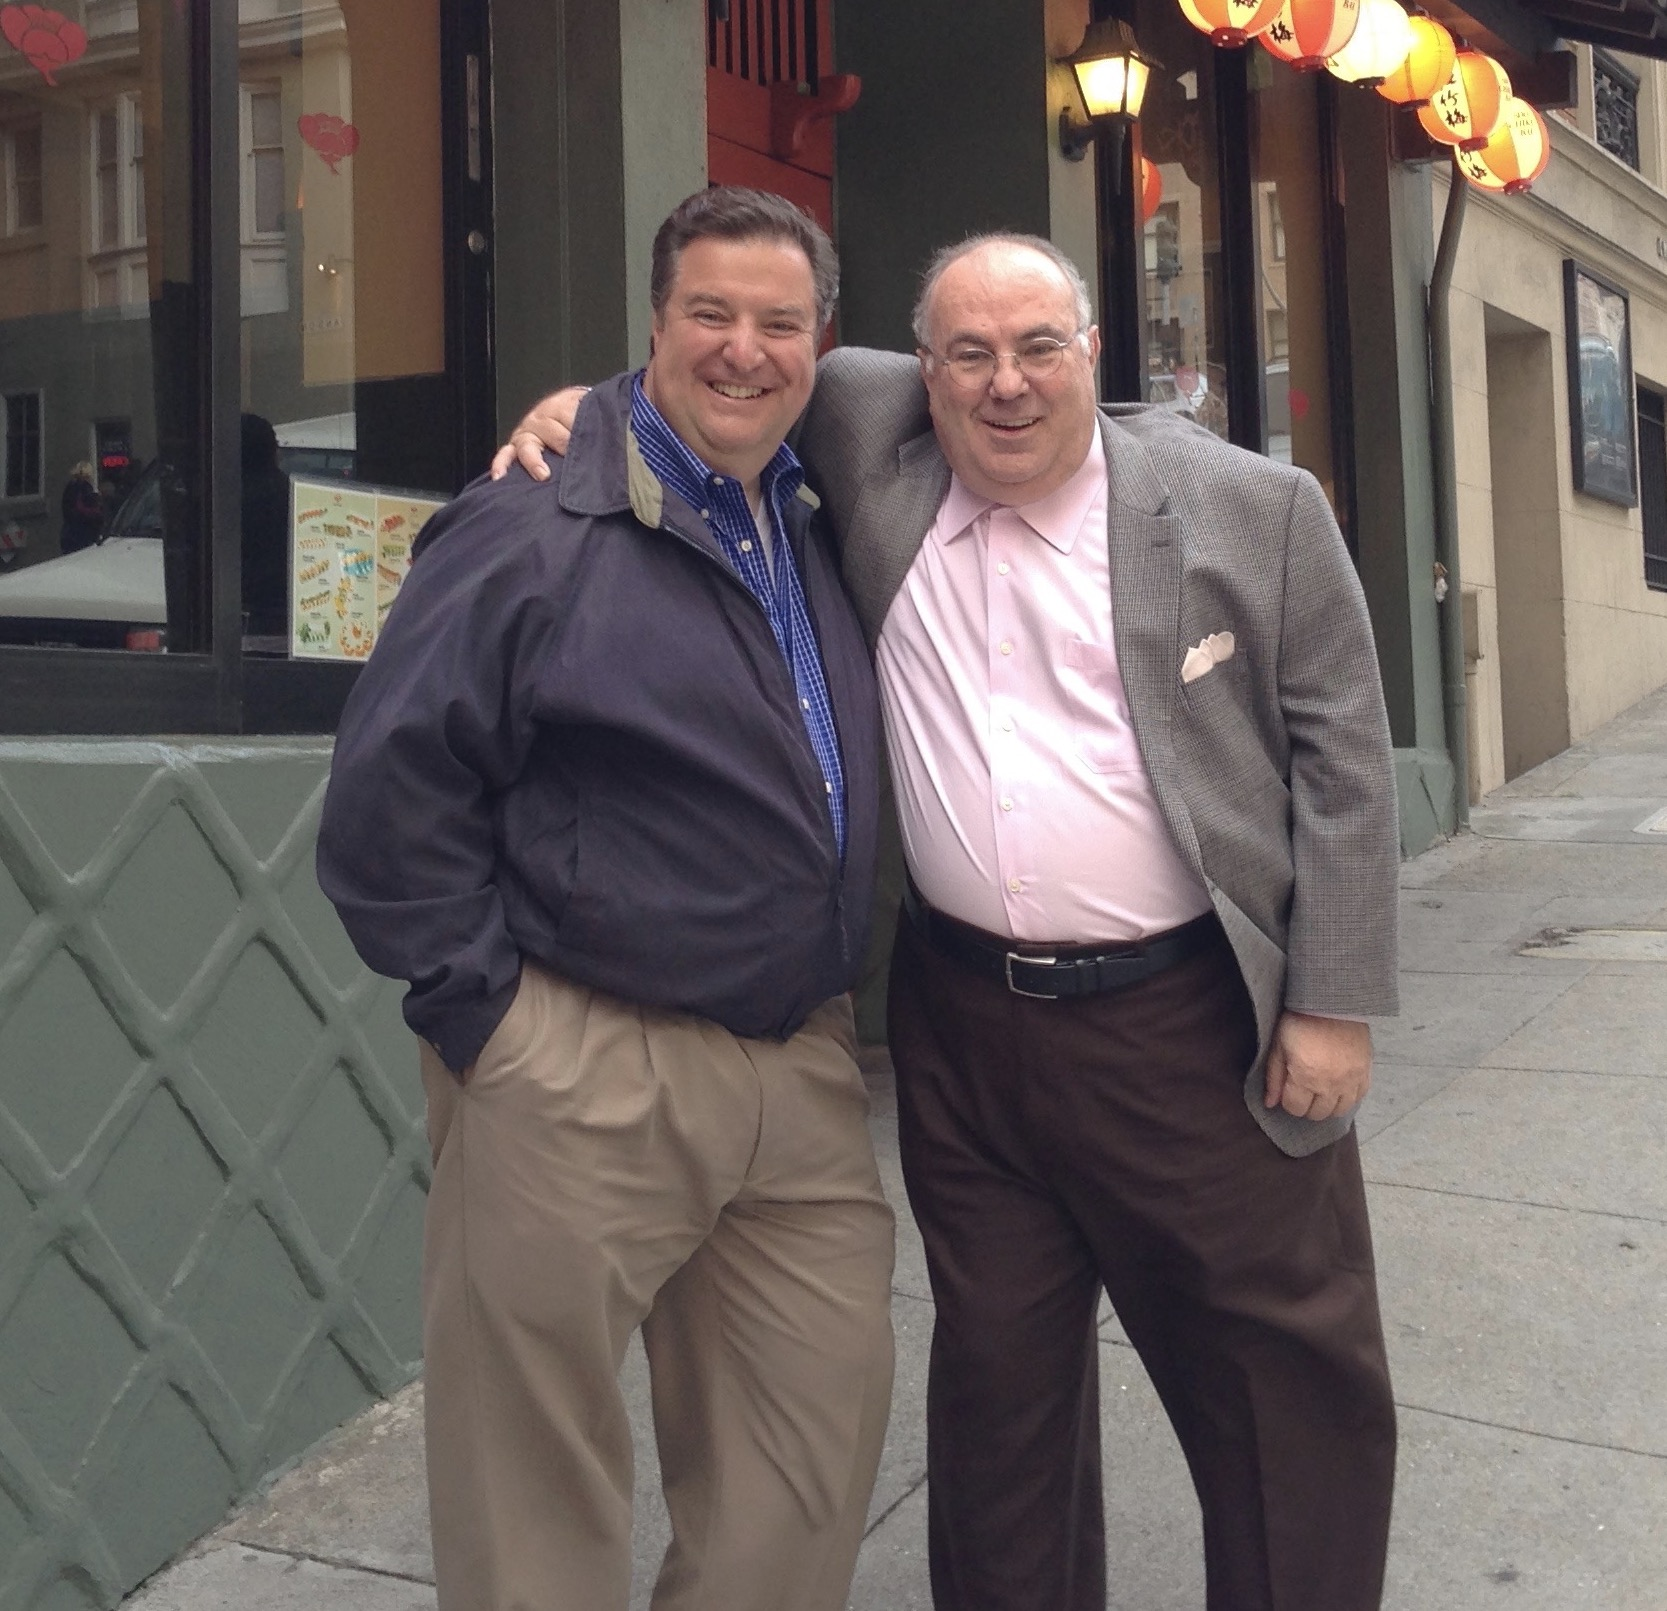 Mark Metzger & Mark Merenda (1950-2017) on the streets of San Francisco